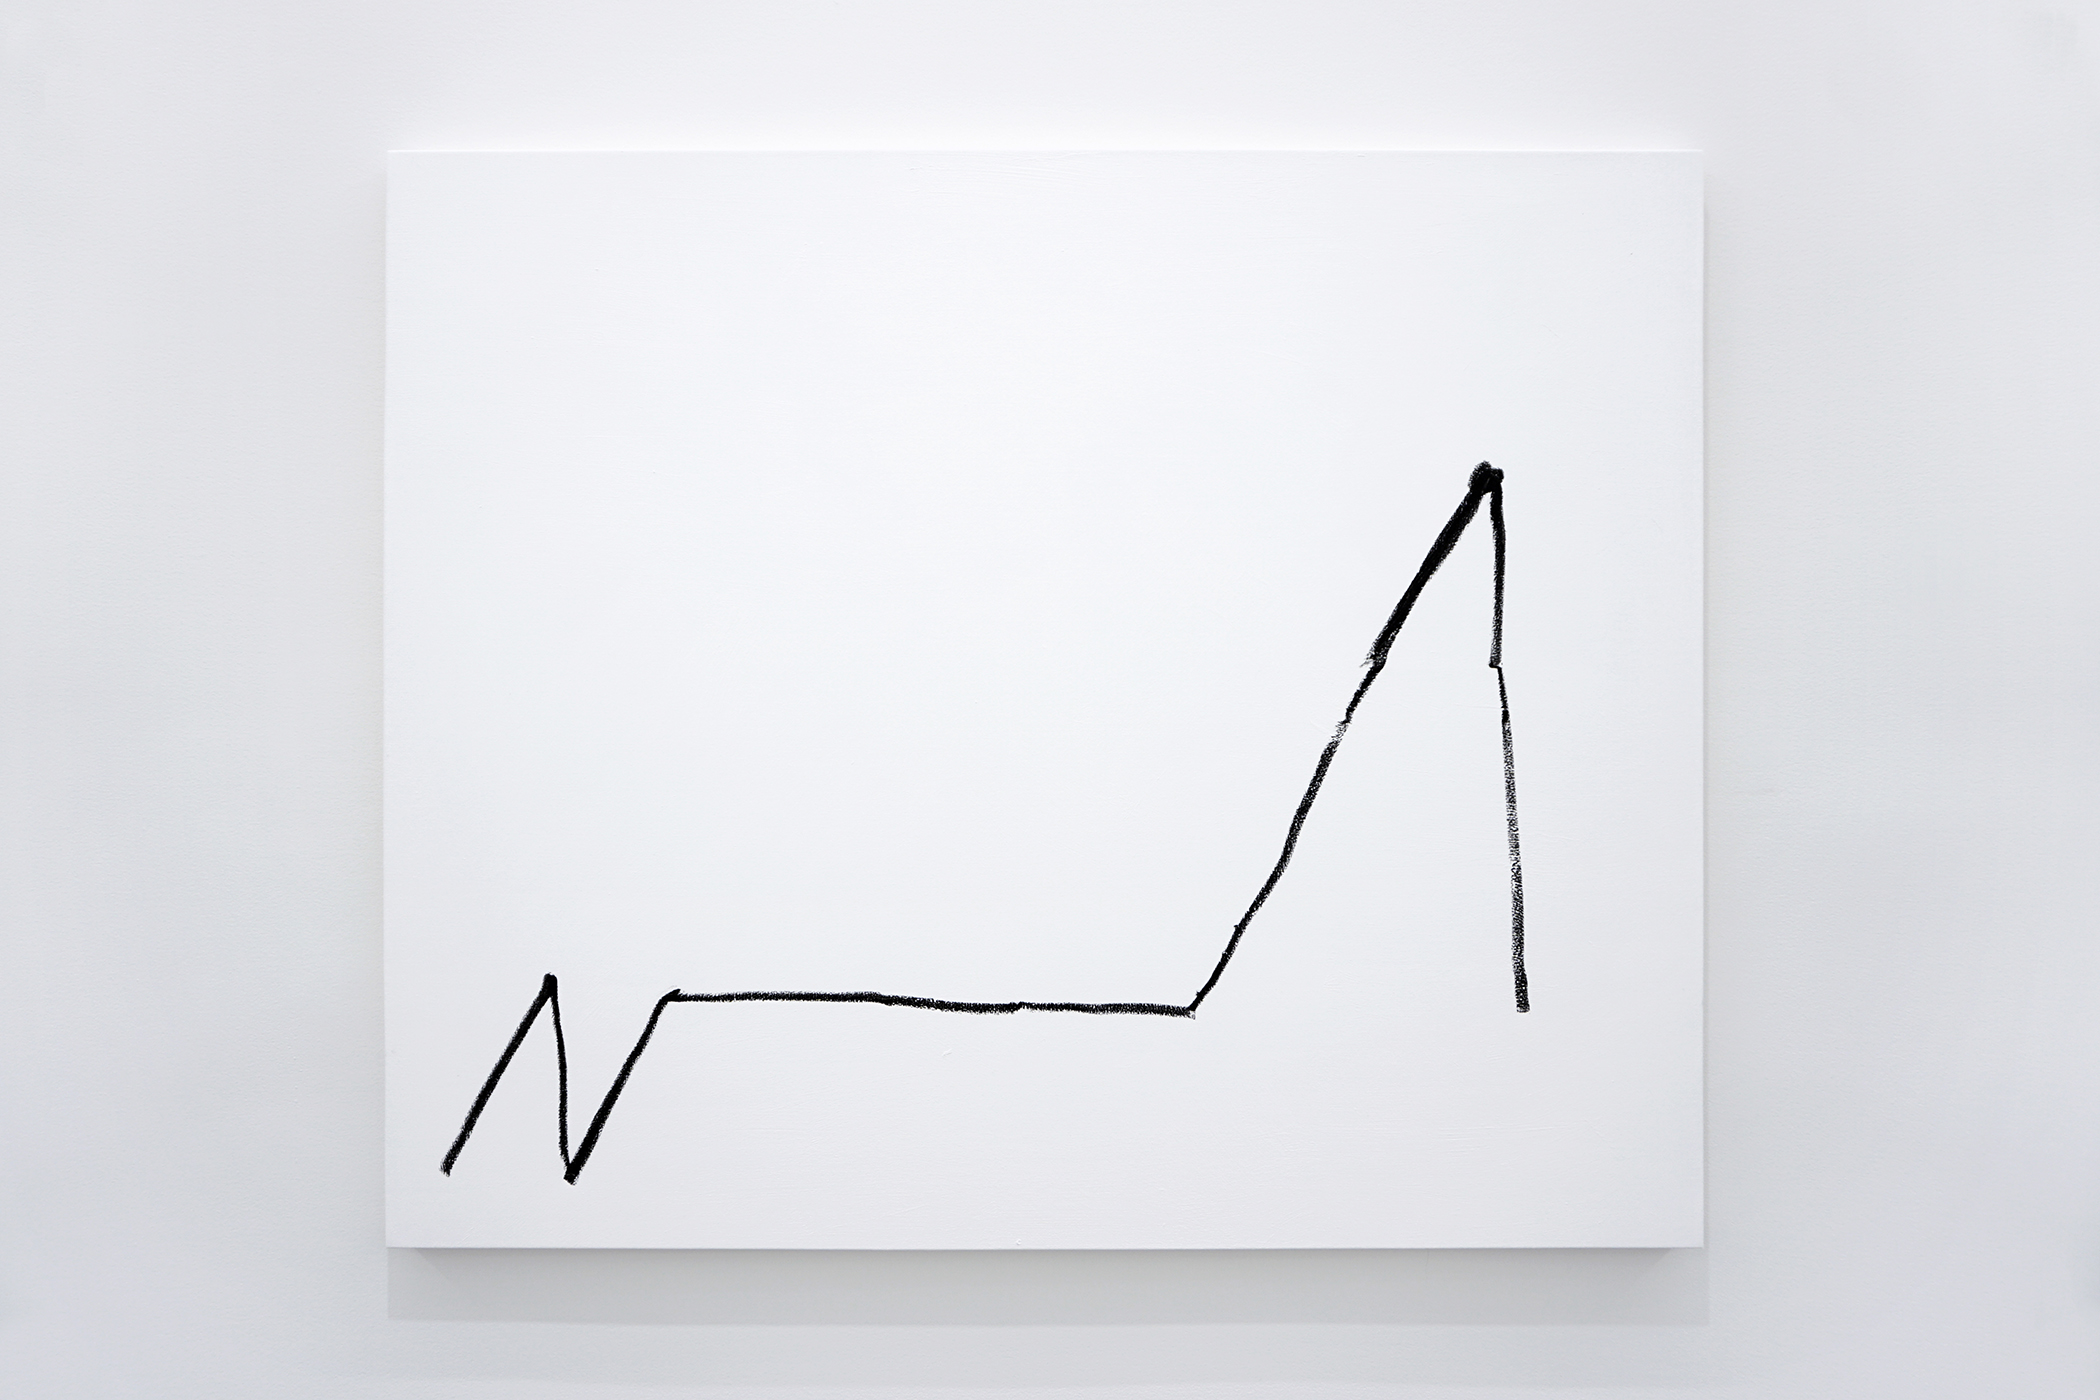 "Sarah Meyohas, ""NASB Financial Inc. on January 14, 2016,"" Oil stick on canvas, 50 x 60 inches."